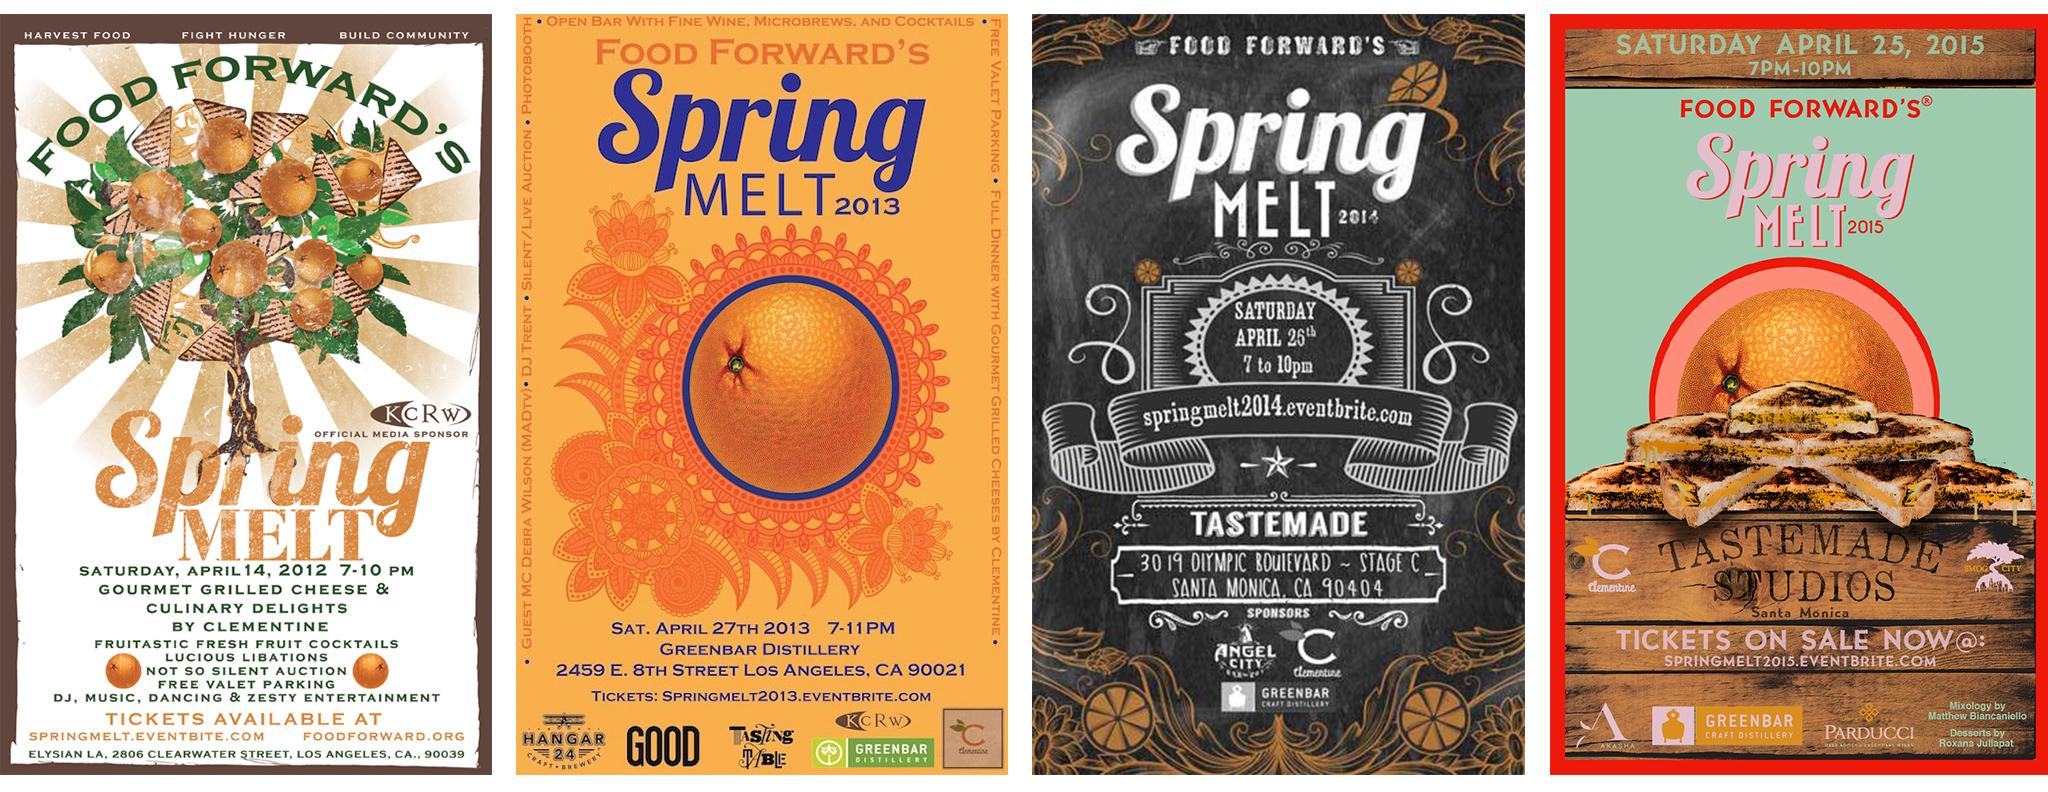 Food Forward-Spring Melt